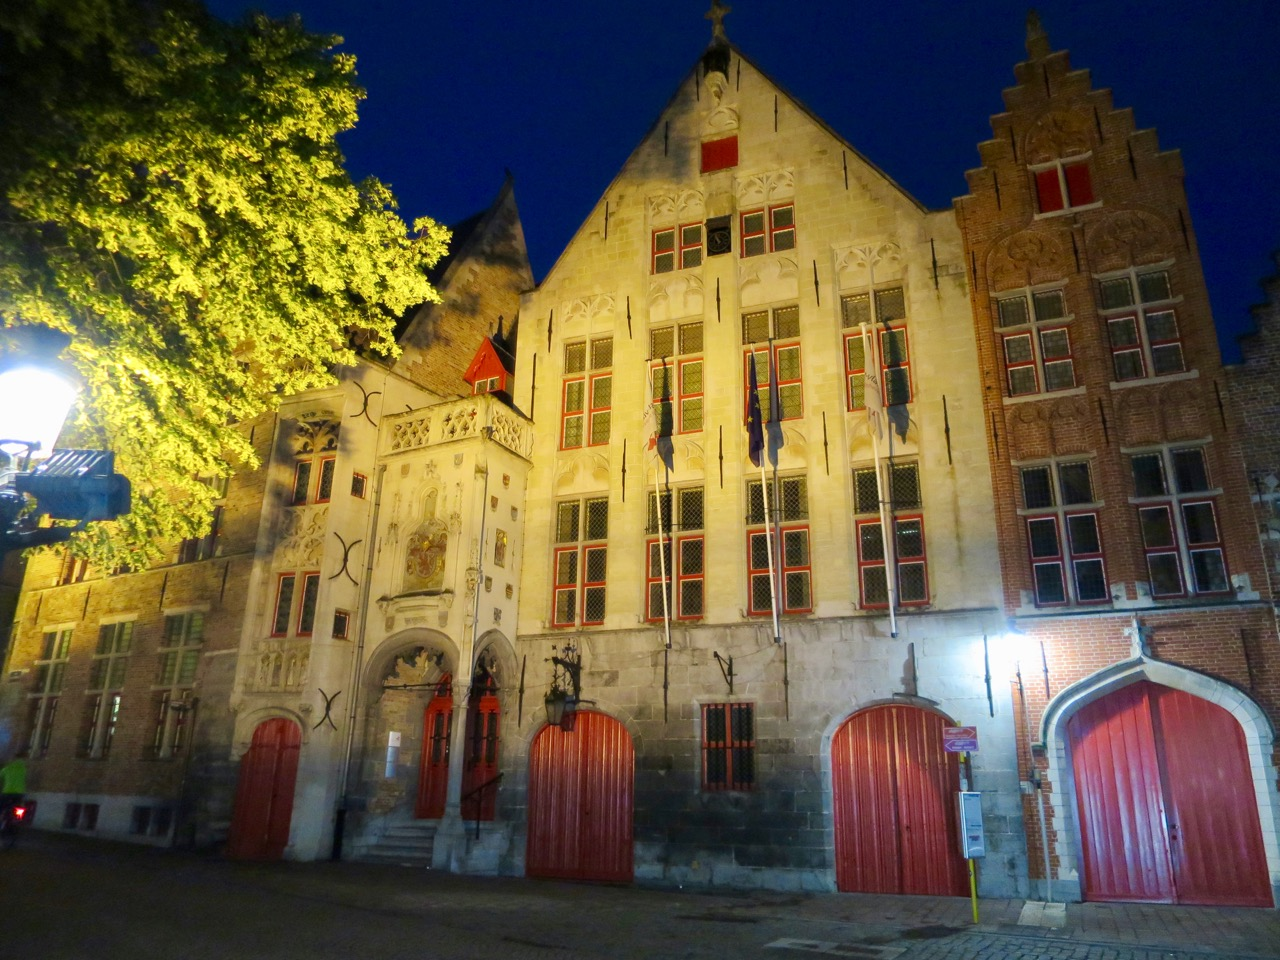 Brugge 1 41